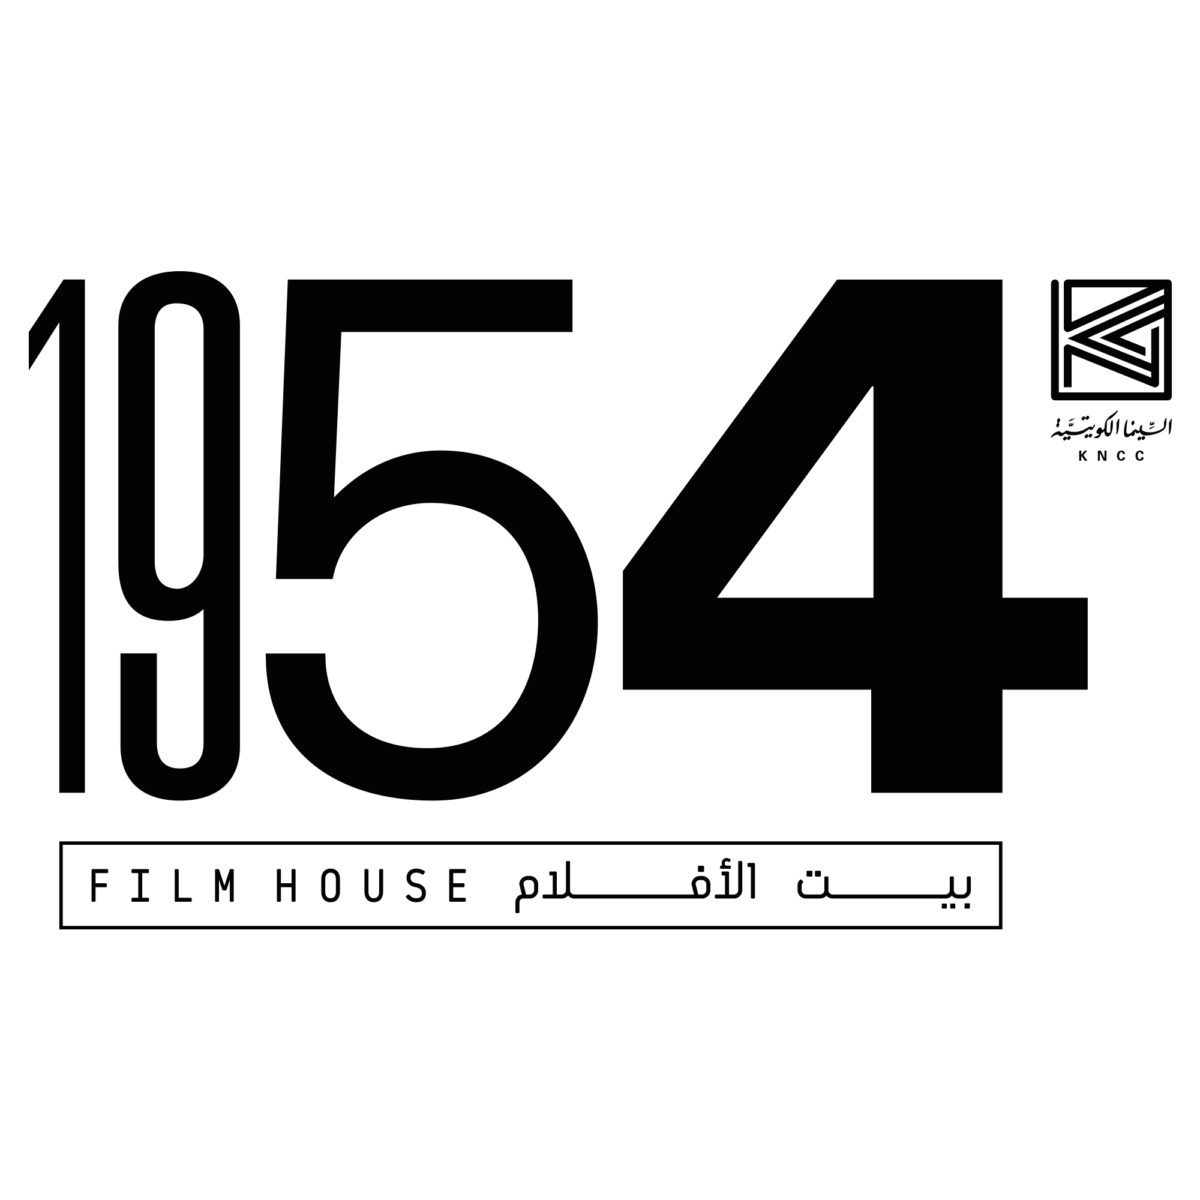 1954 Film House